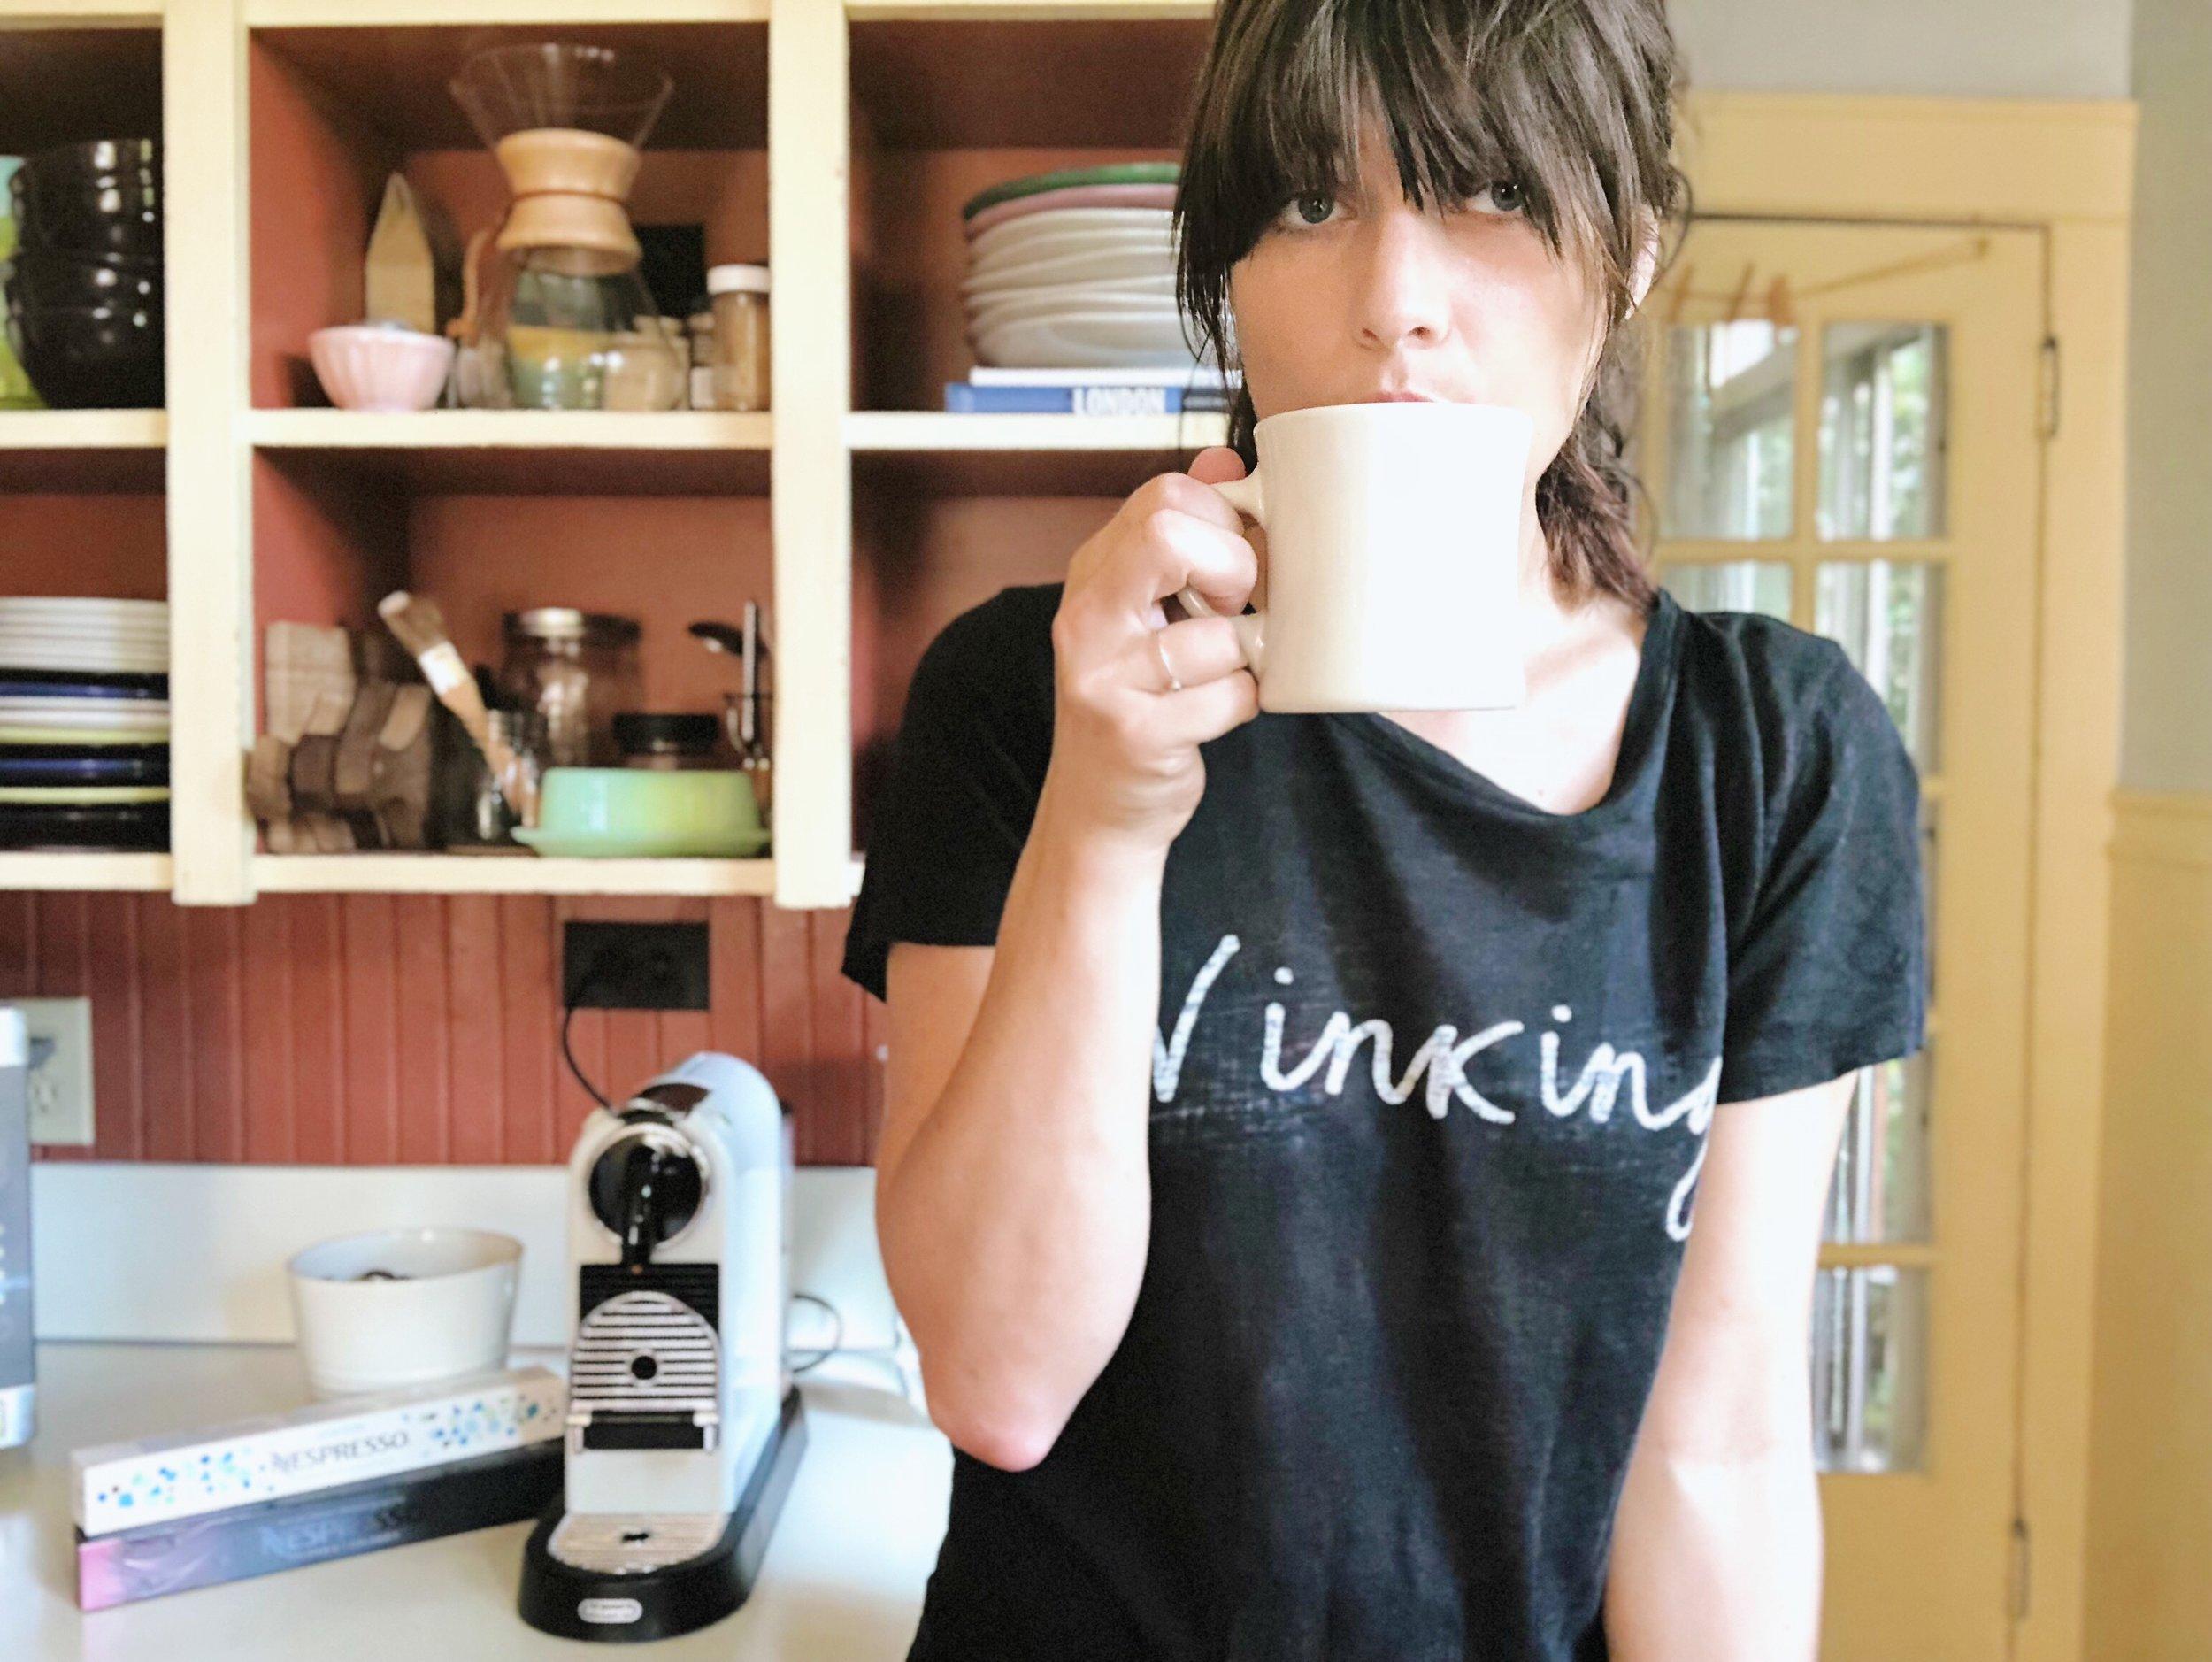 Gretchen has the floor, nexpresso, coffee